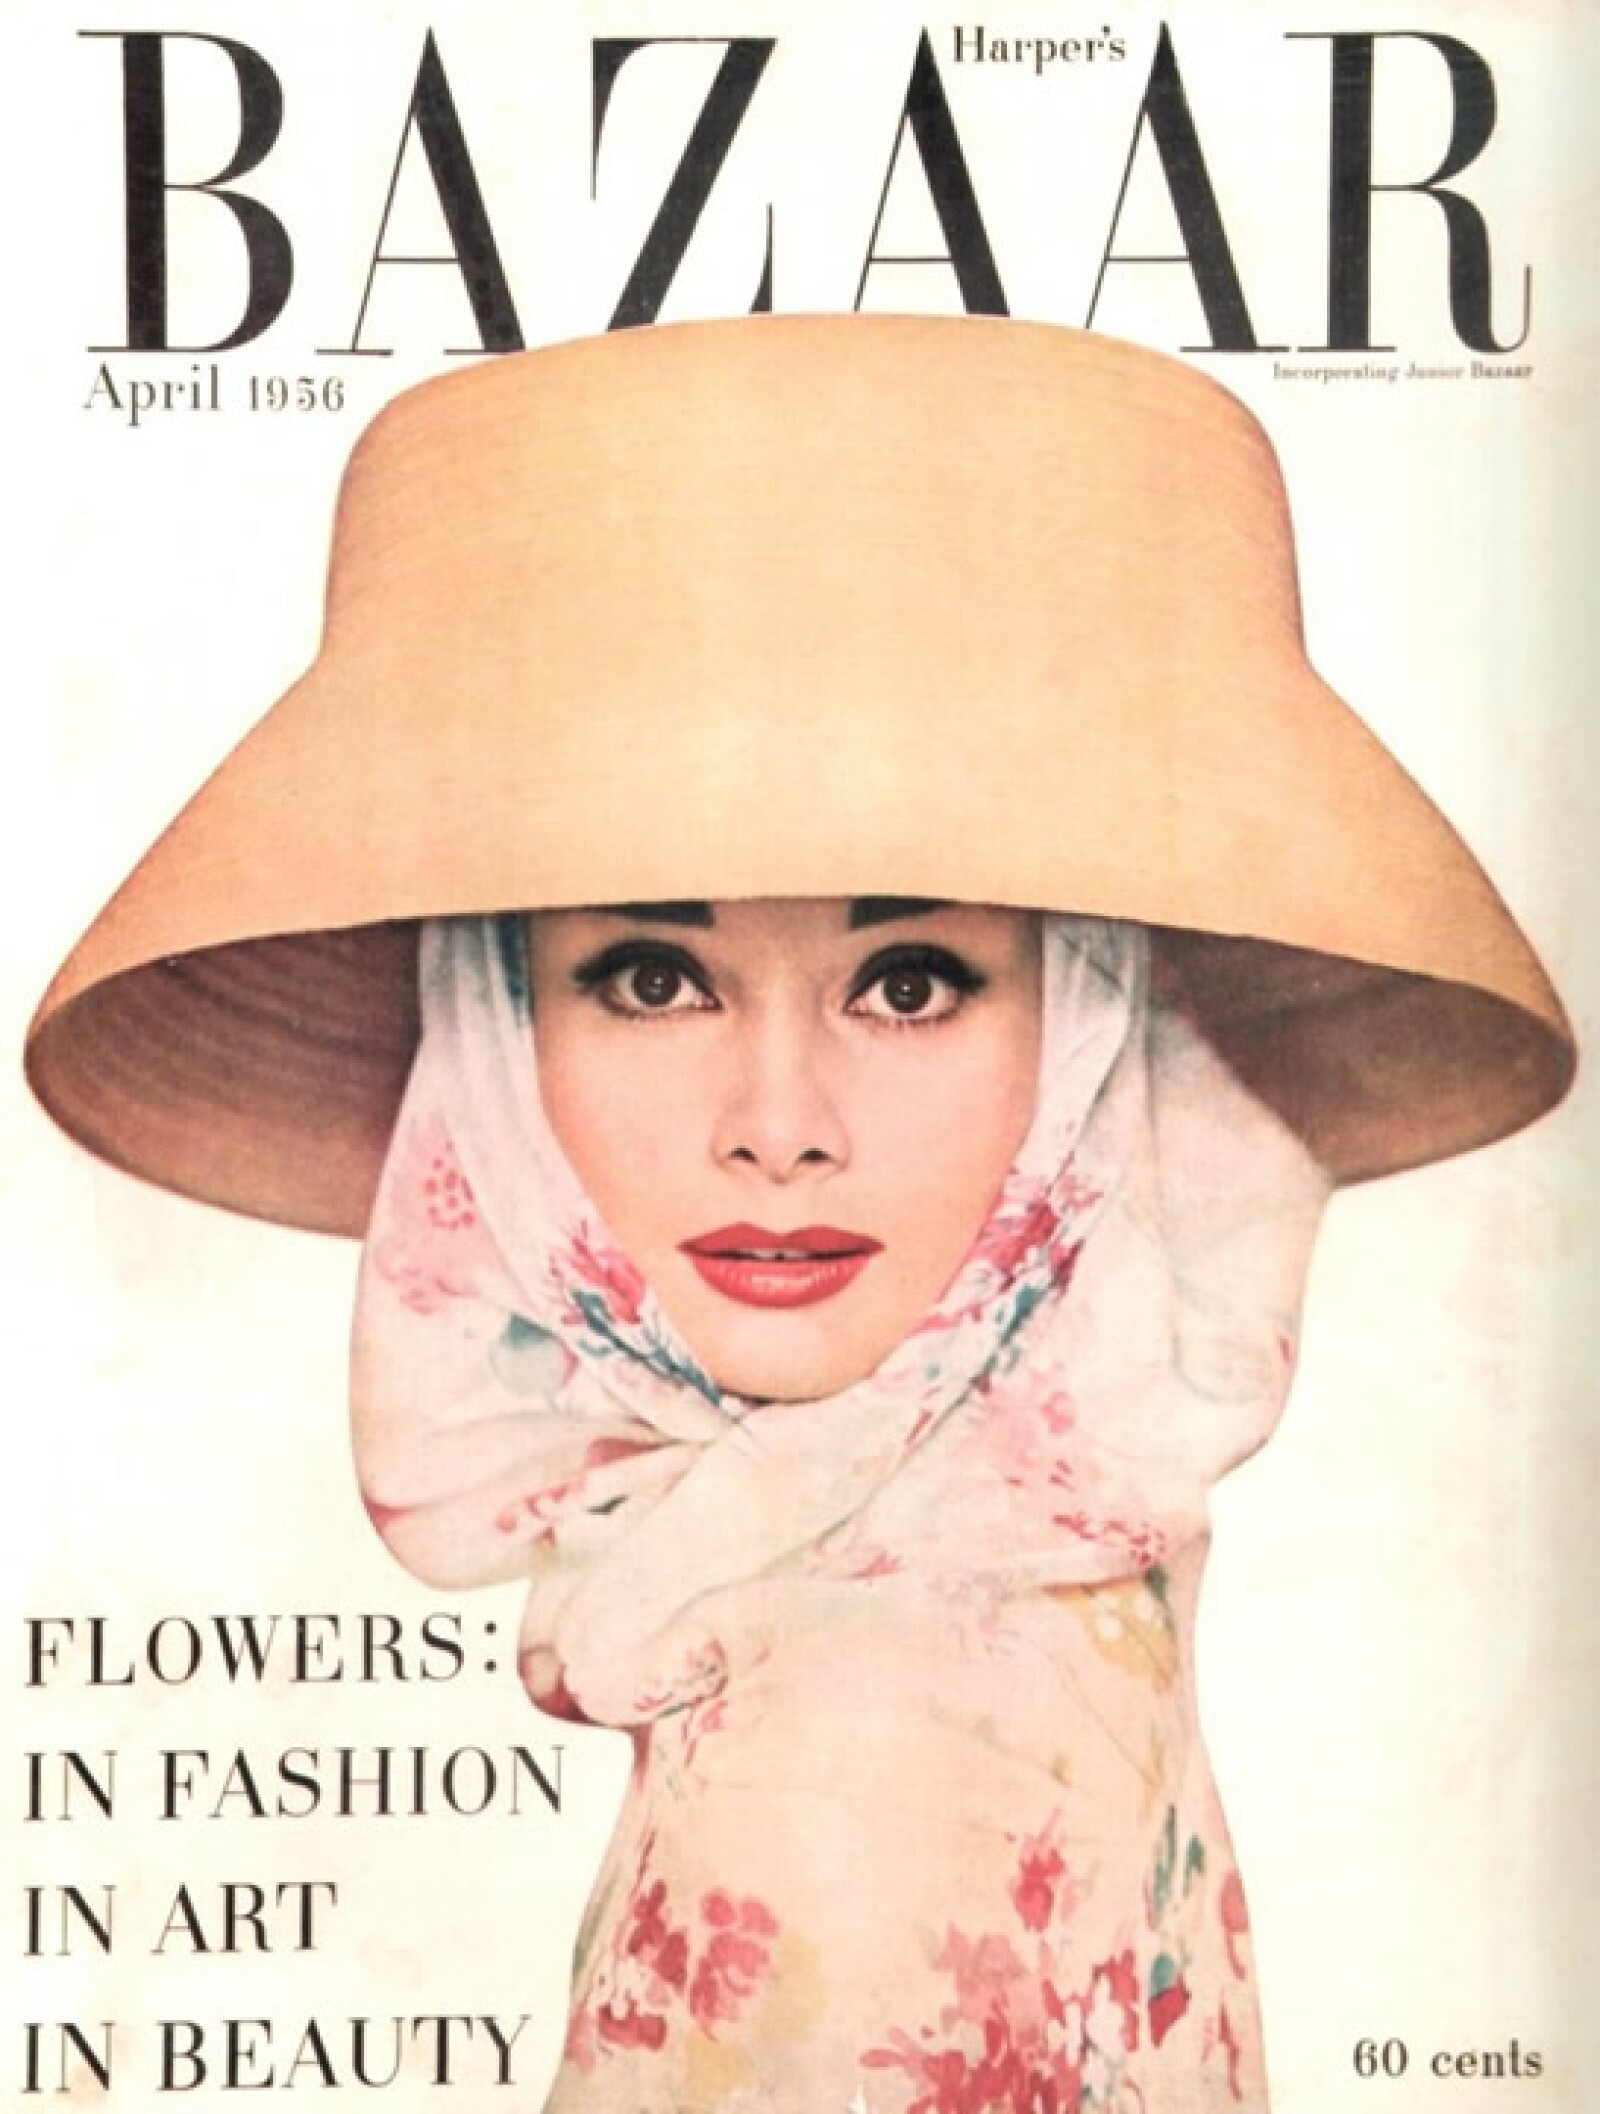 Harpers Bazaar, abril 1956: Audrey Hepburn fue la portada del mes de abril para la revista.